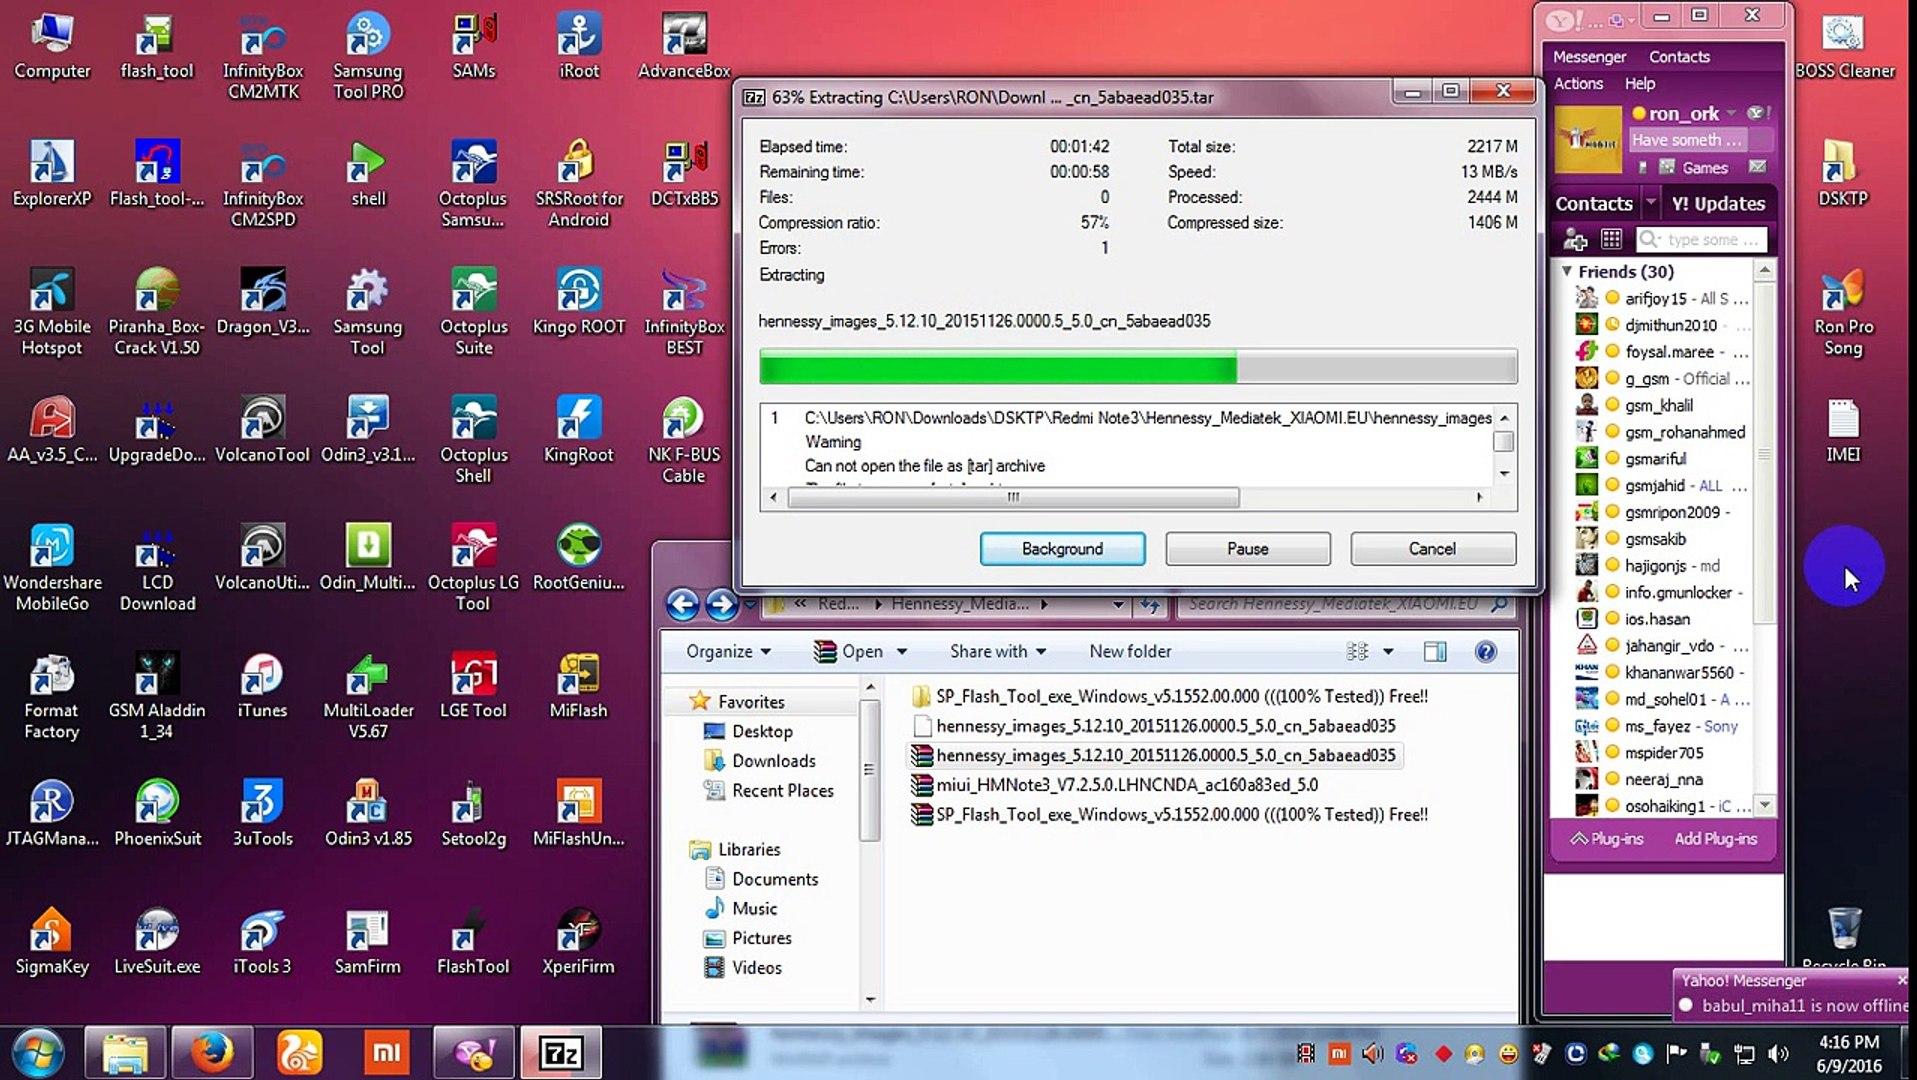 MI Redmi Note3 Mediatek Full Flash & MI'cloud done 100% Tested By Ron